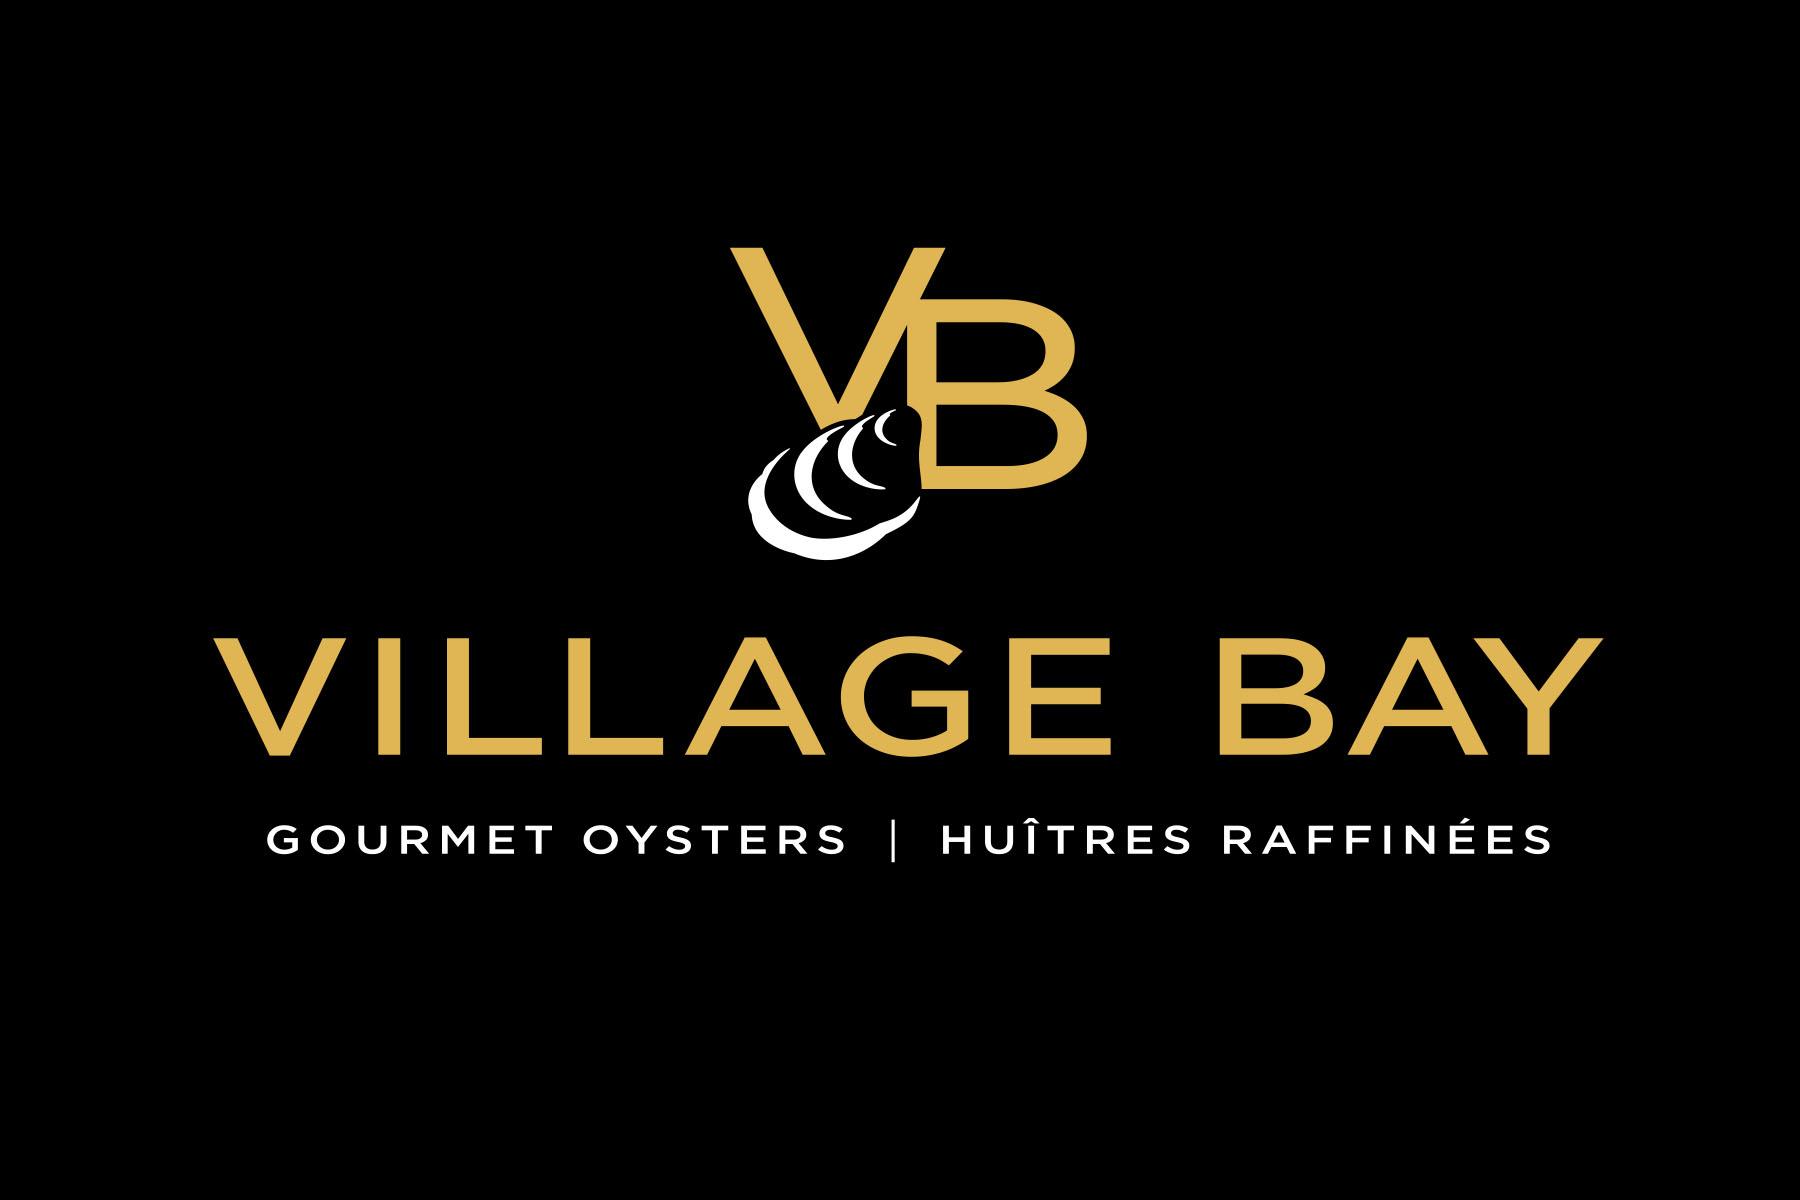 village bay logo